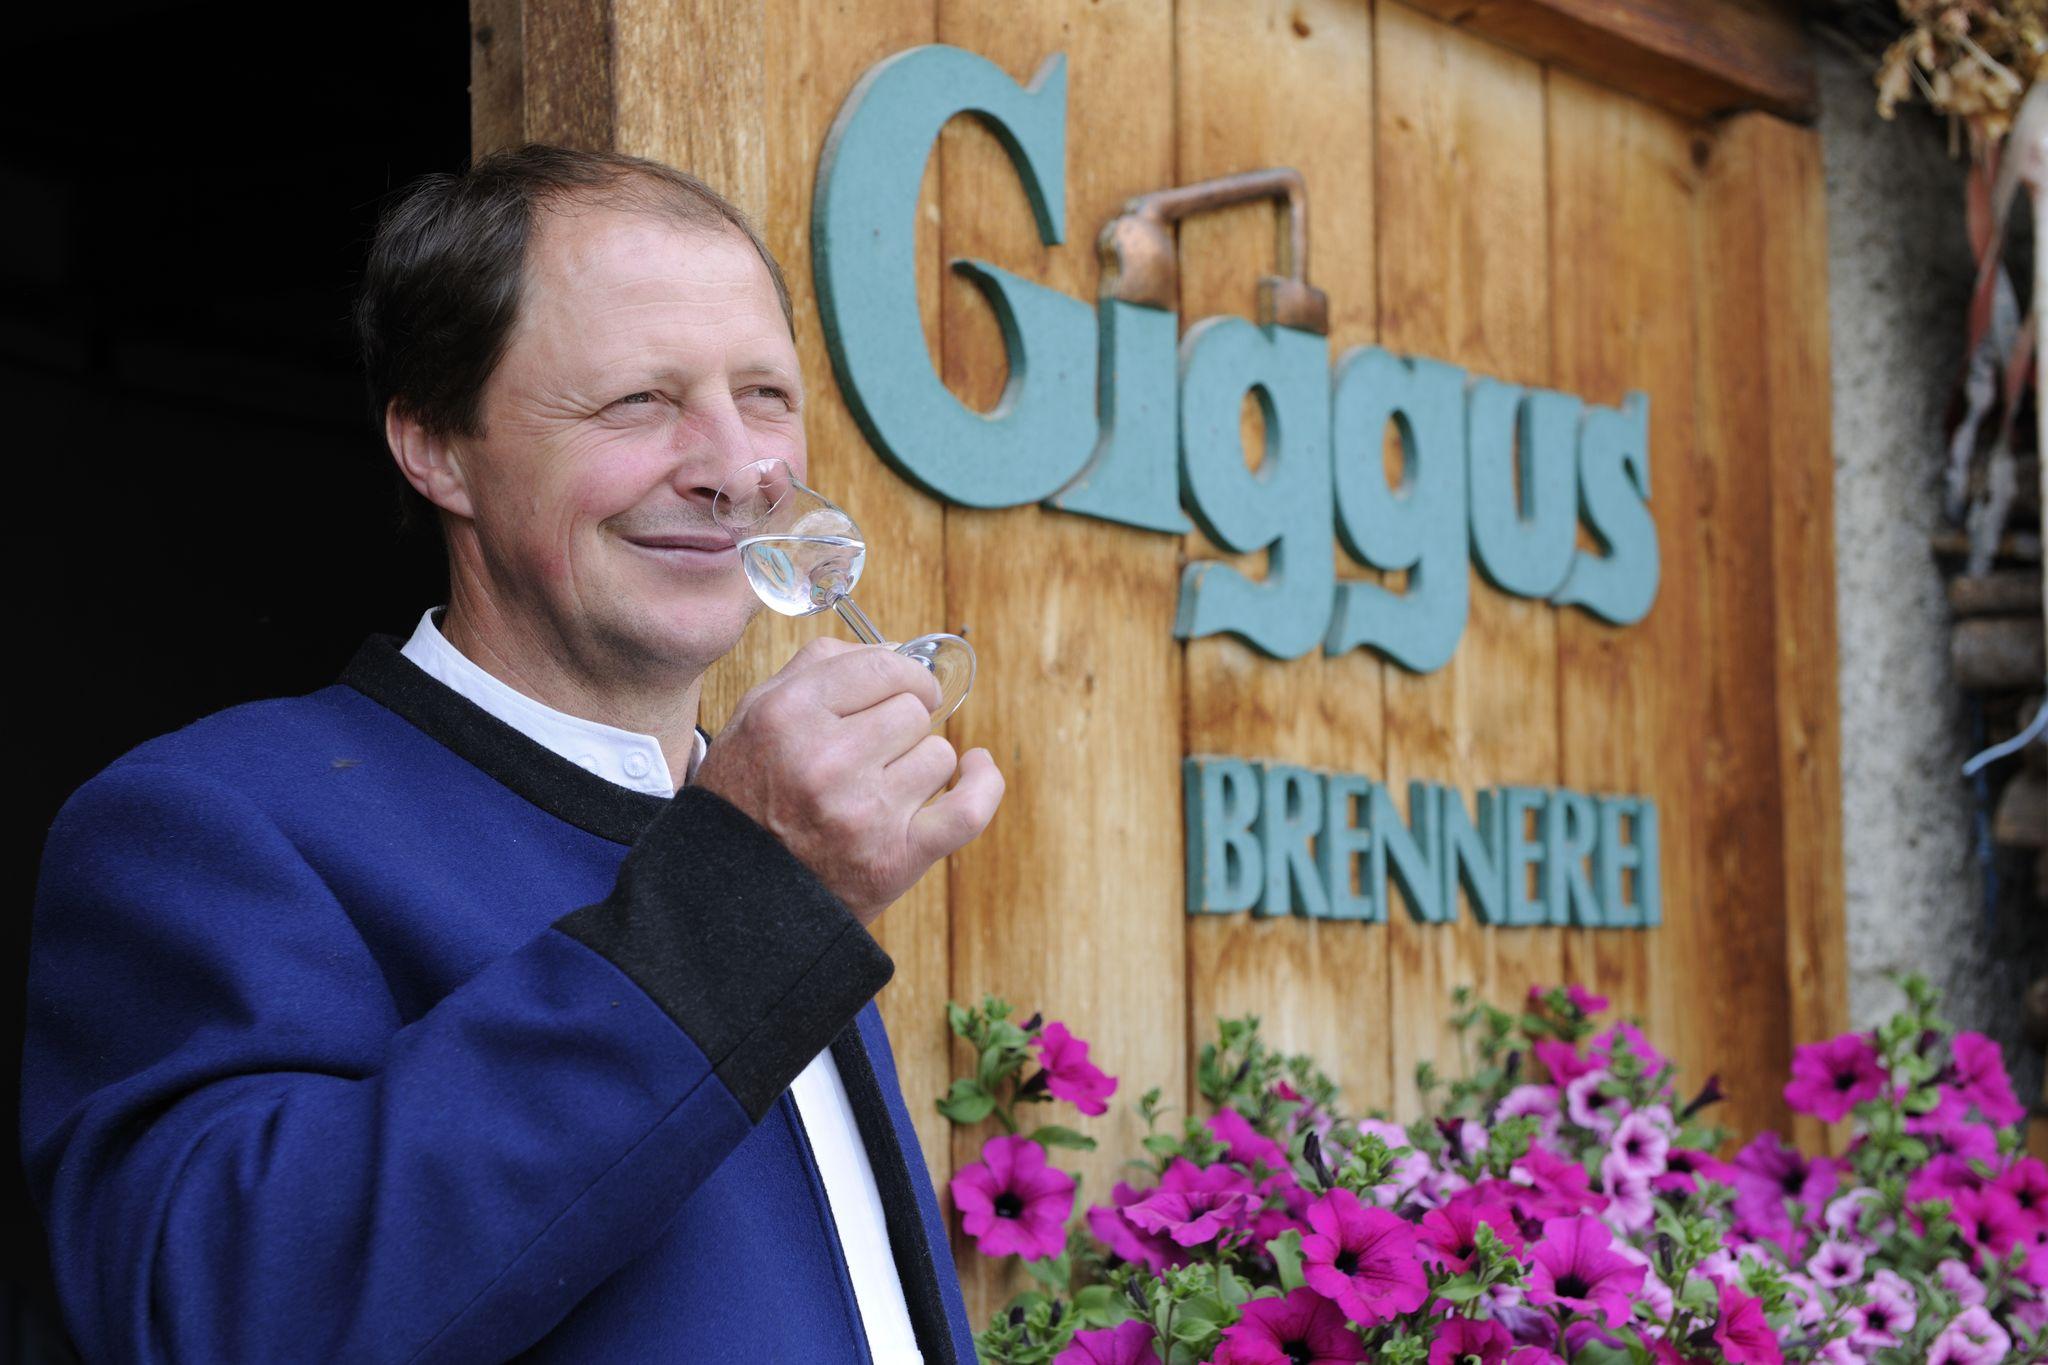 Brennerei Giggus - Nothdurfter